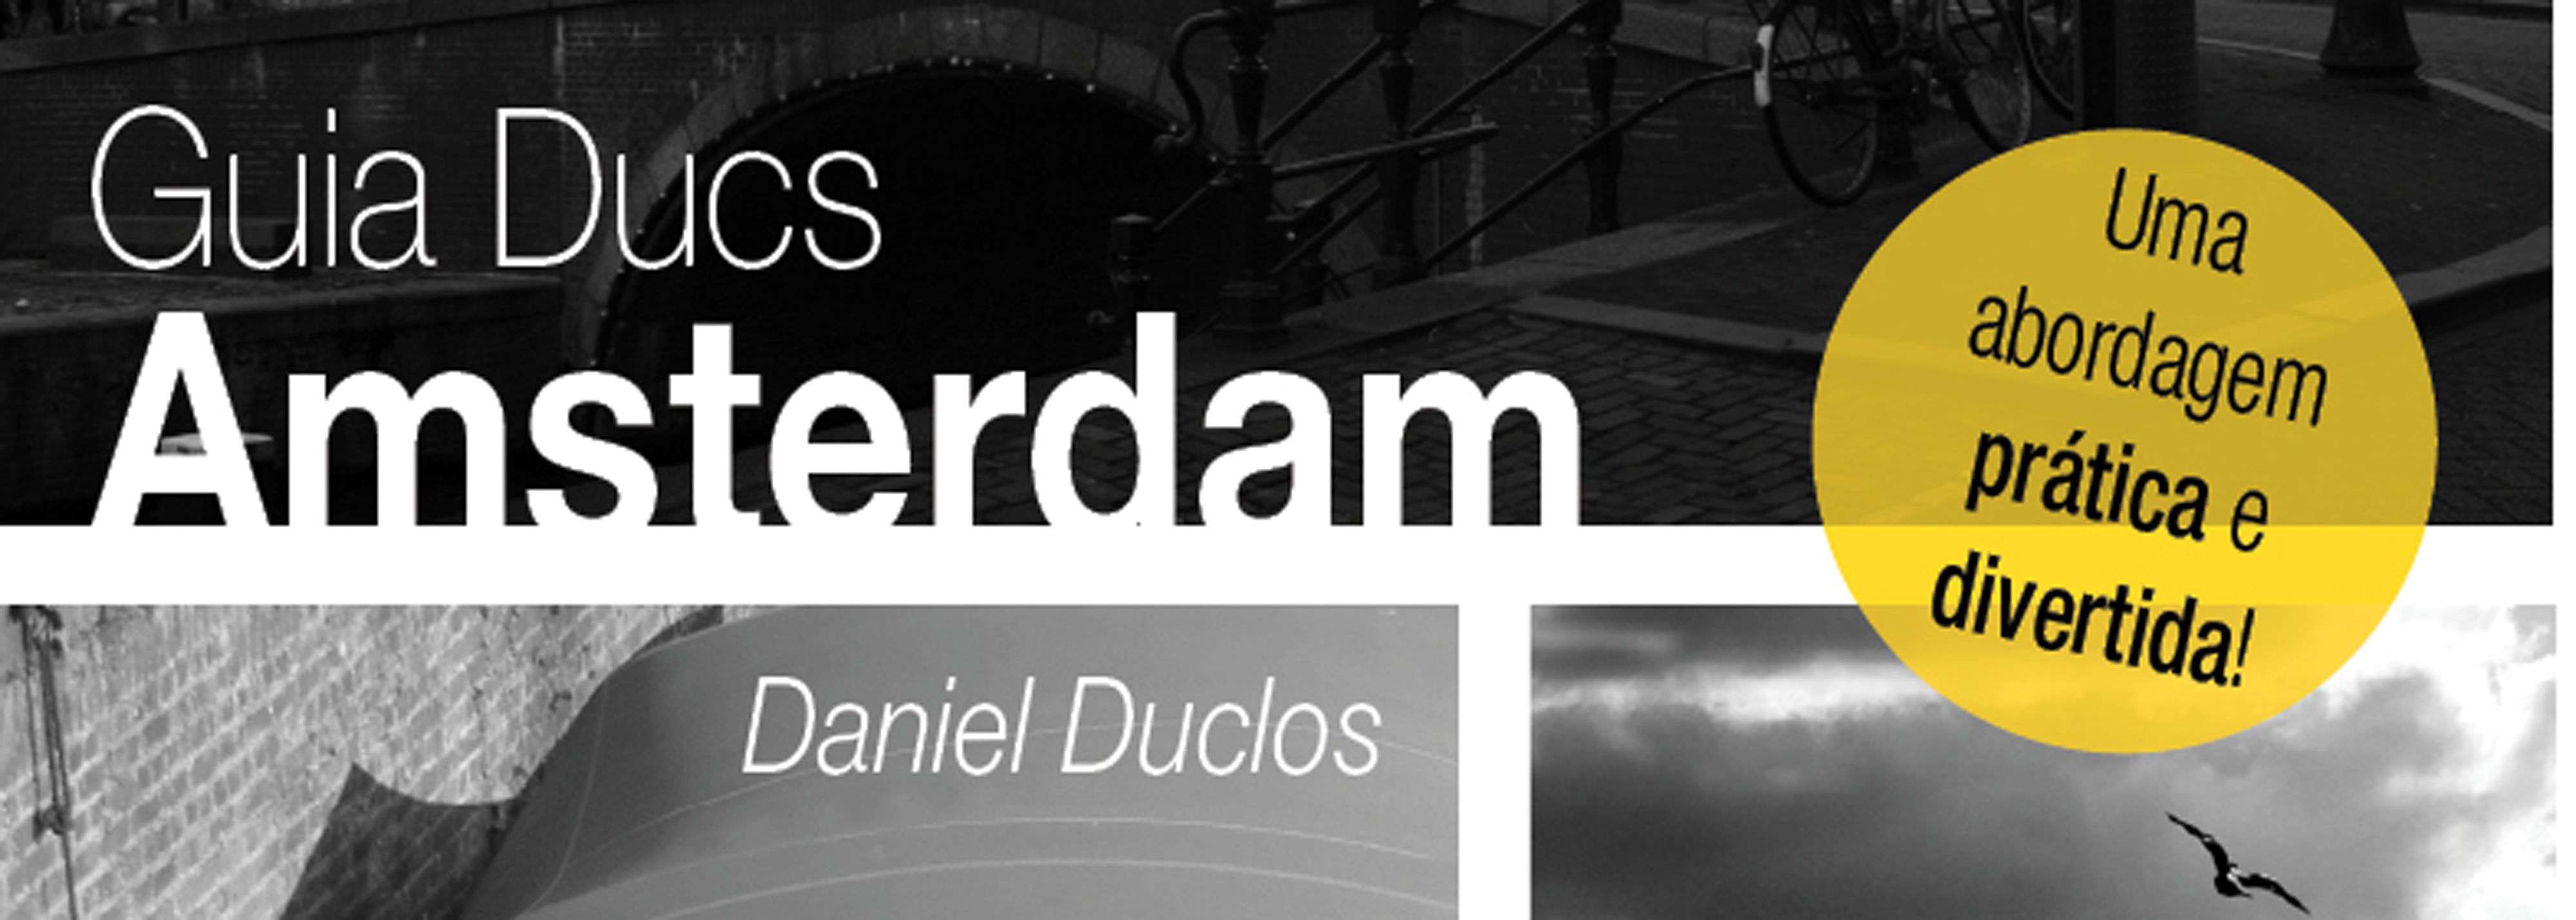 Capa do Guia Ducs Amsterdam